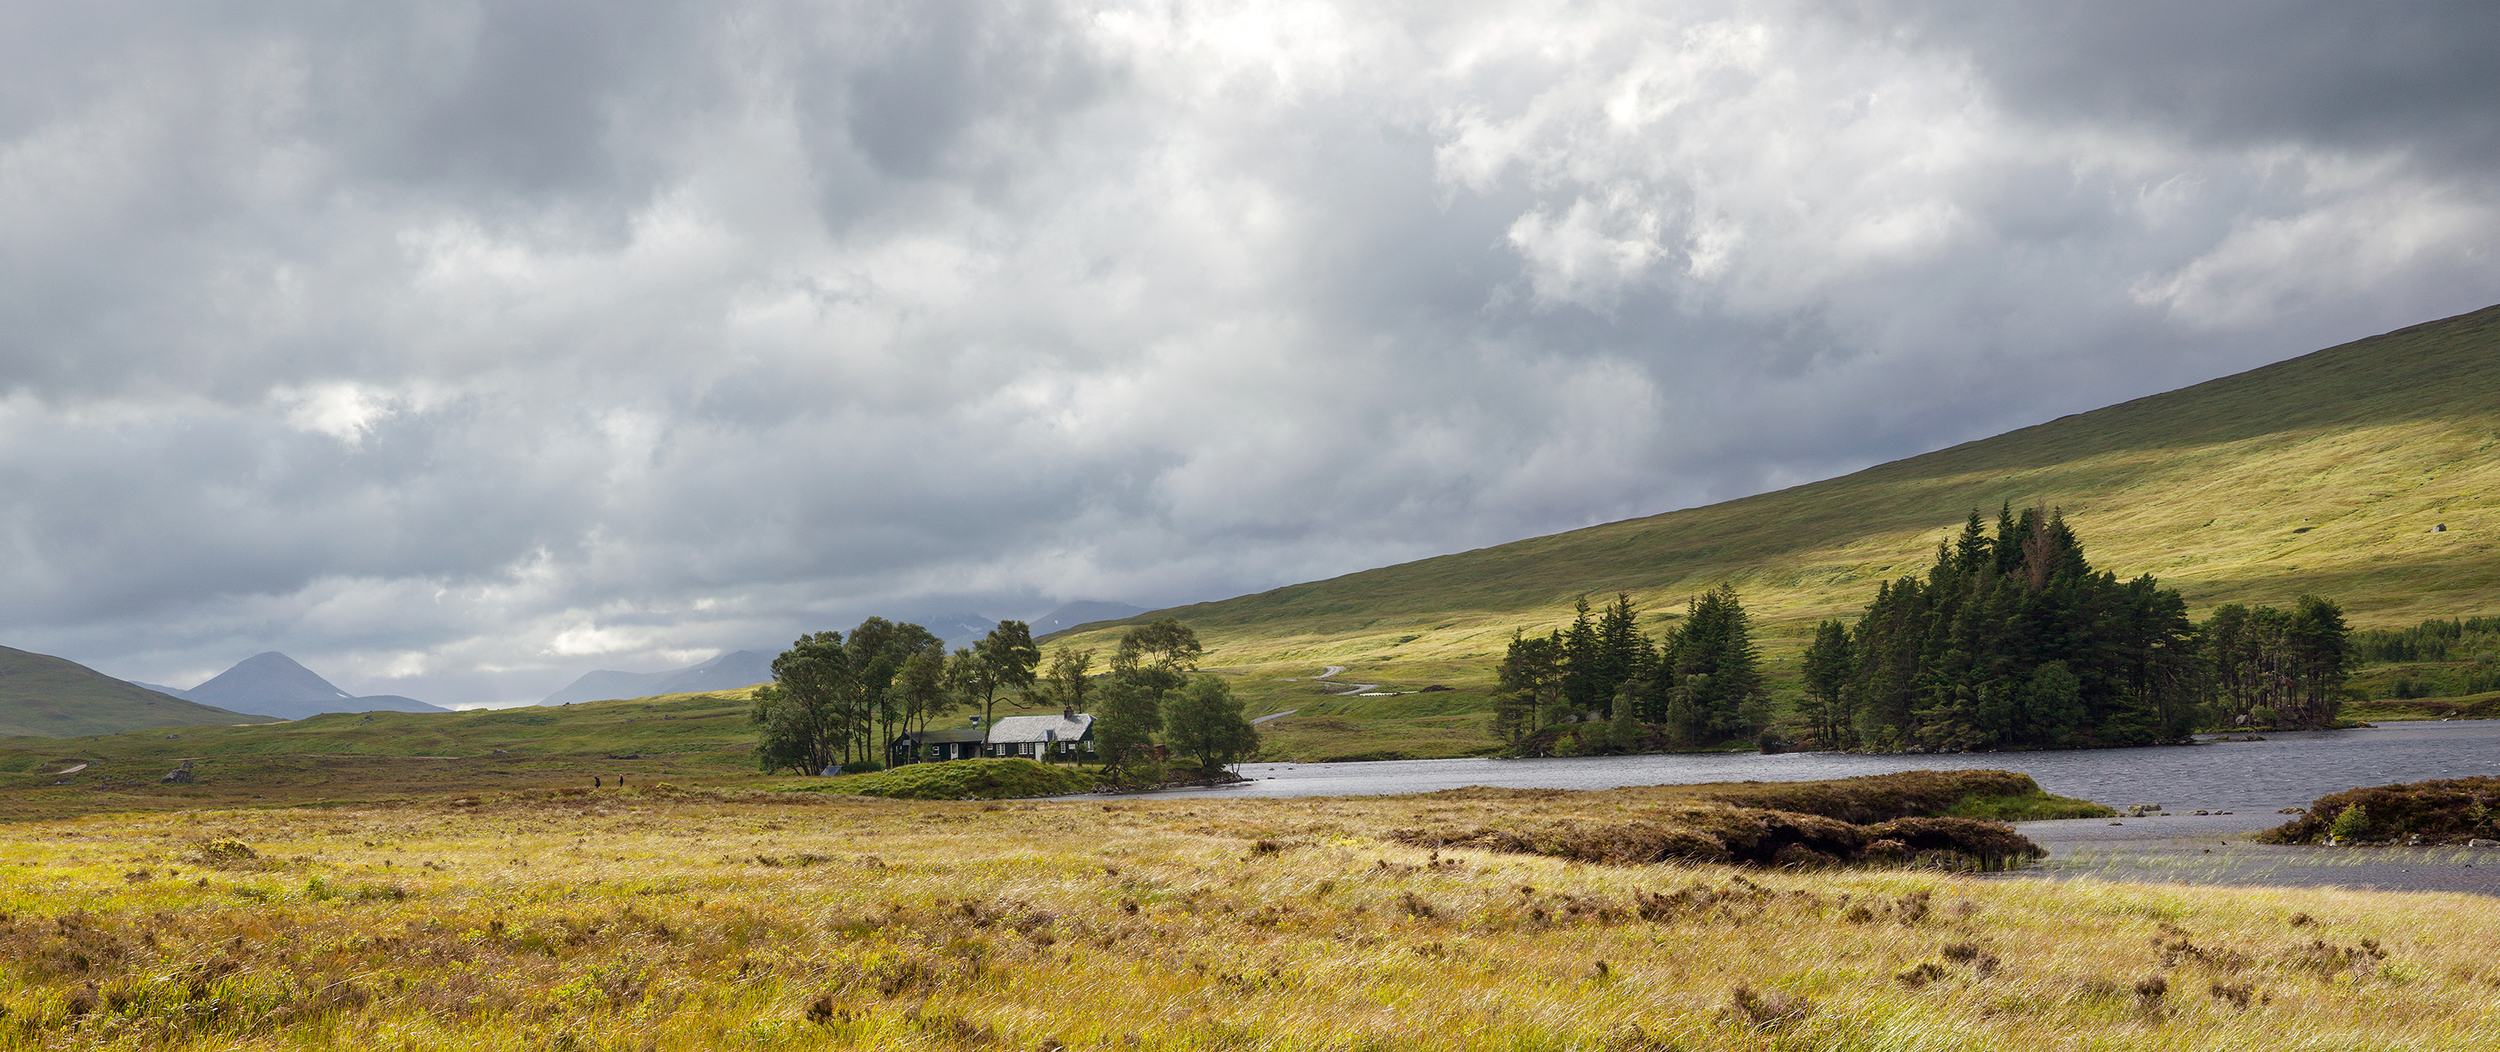 Scotland by Siv